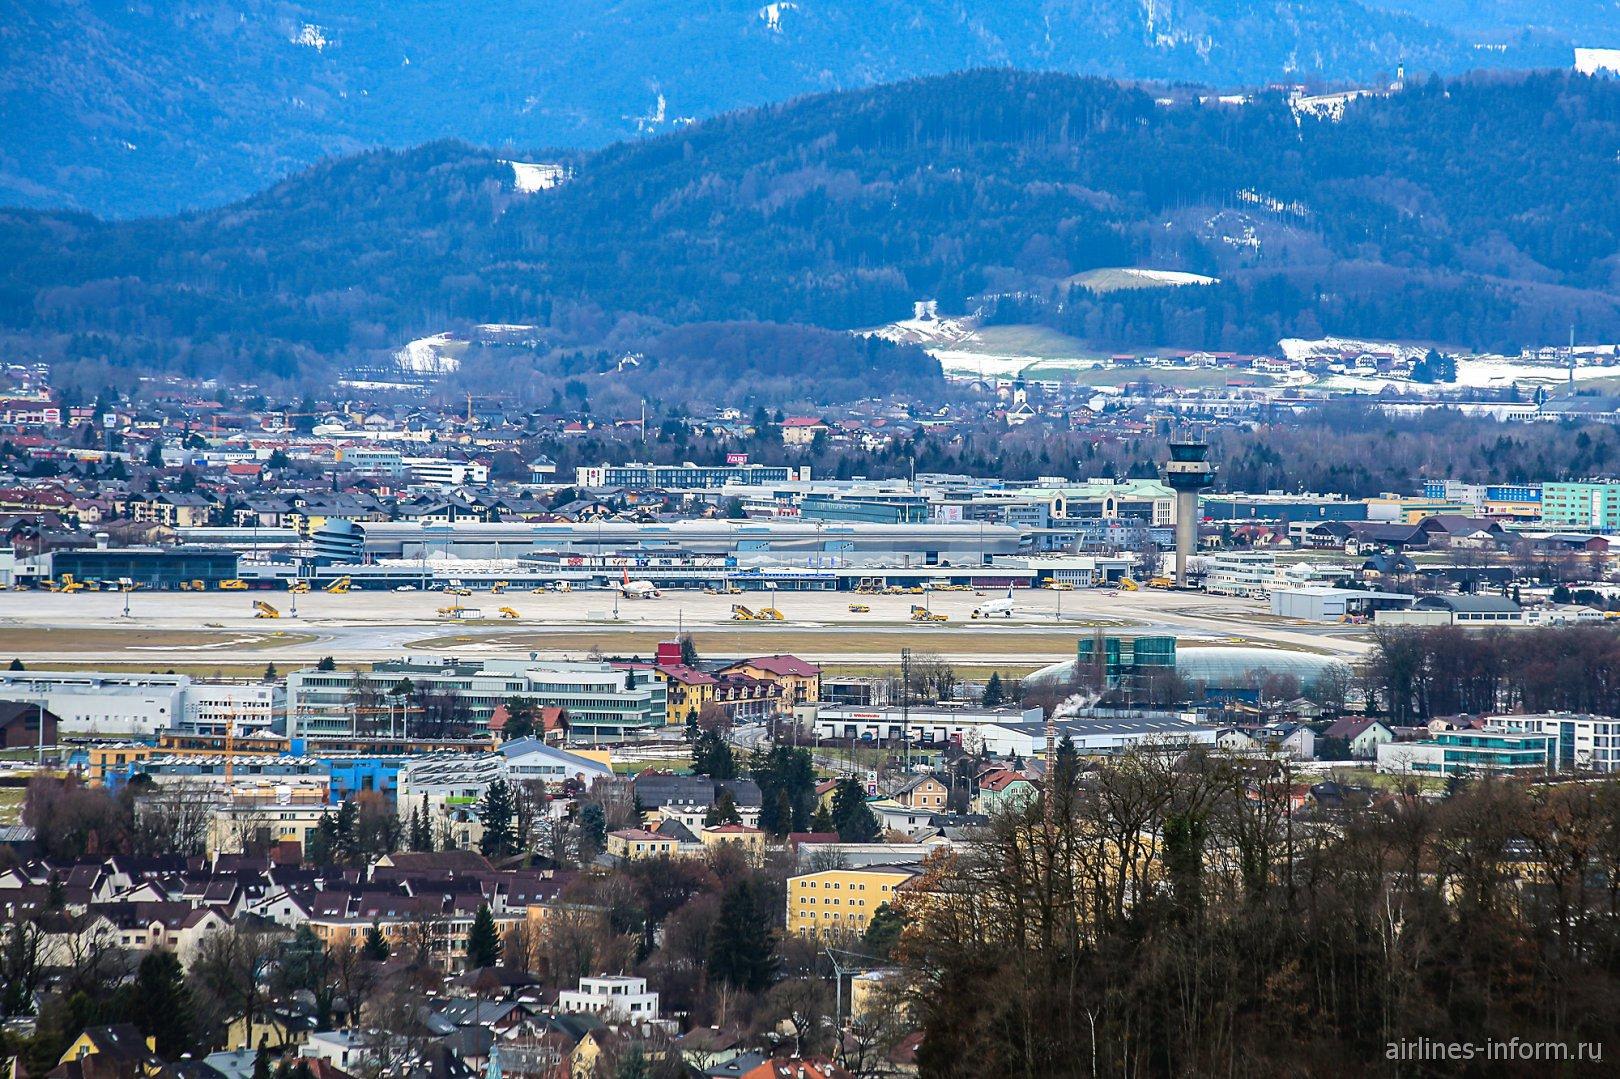 Вид с крепости Хоэнзальцбург на аэропорт Зальцбург